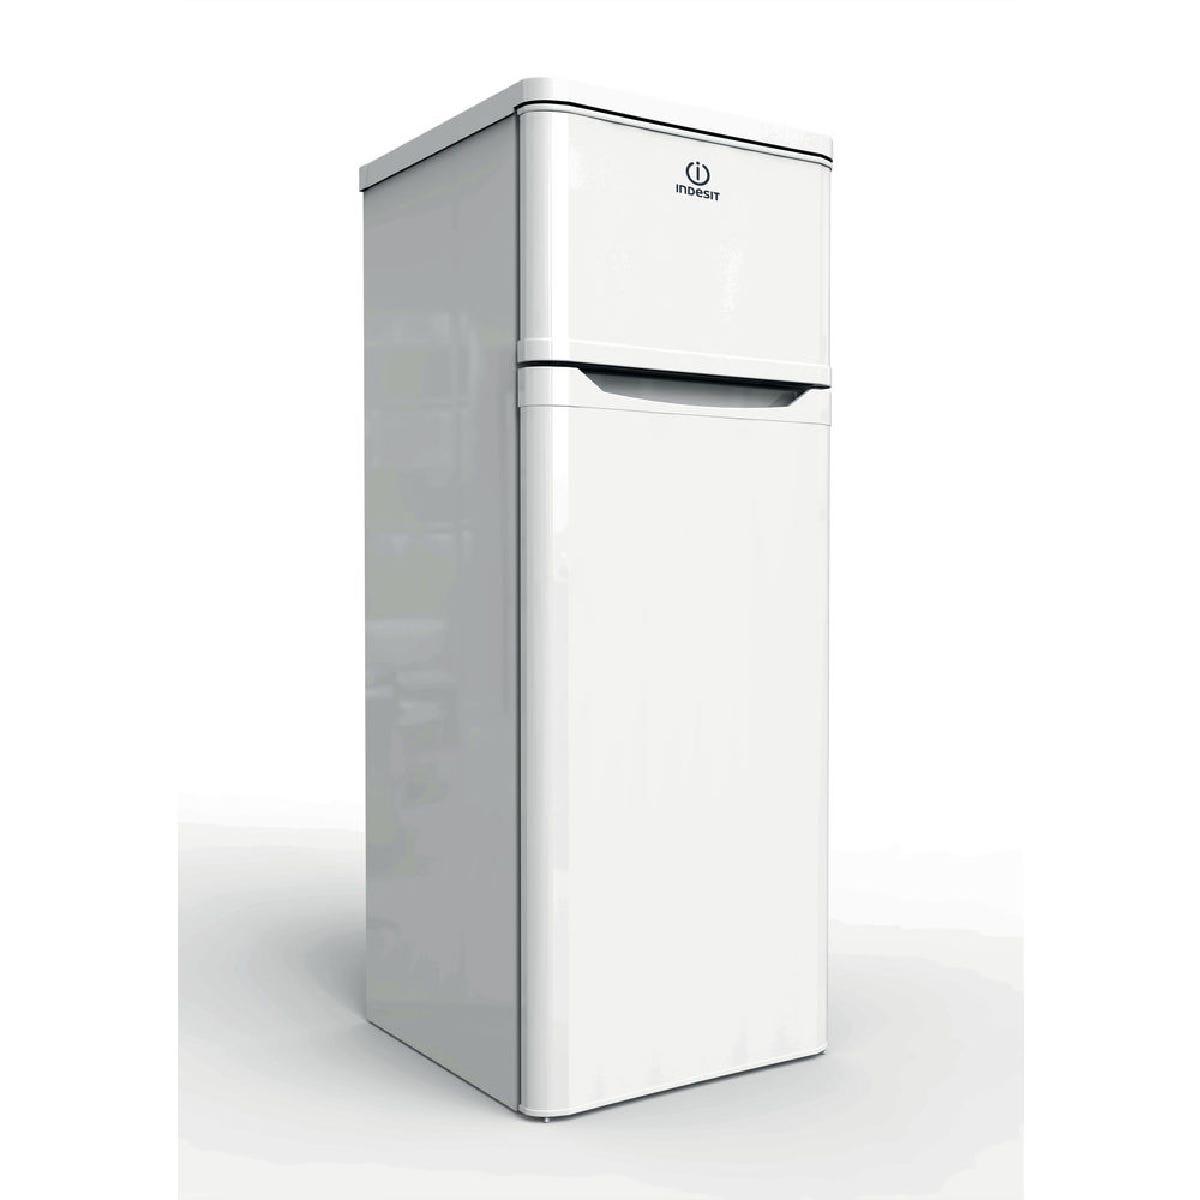 indesit raa 29.1 fridge freezer - white